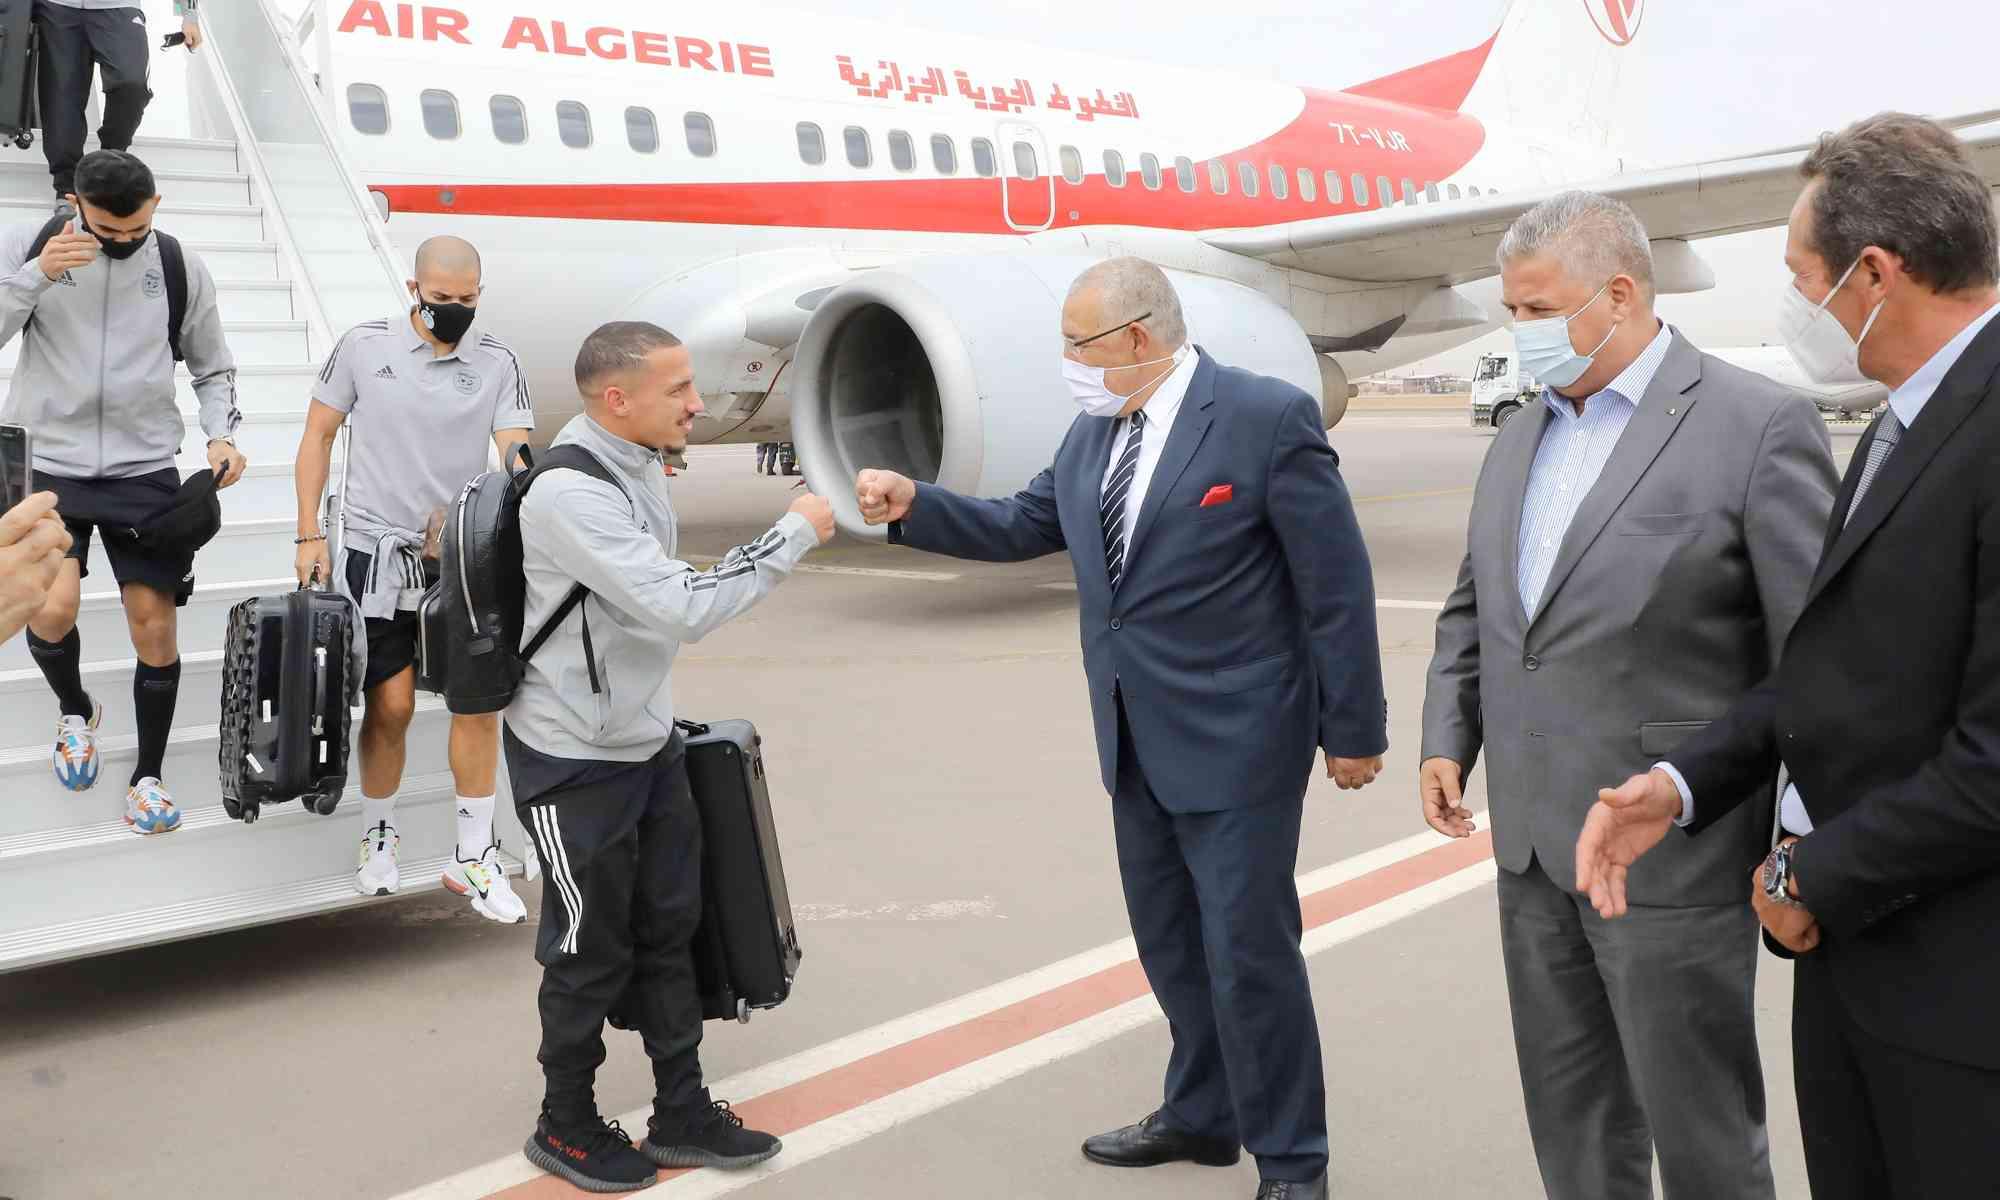 bennacer arrivee delegation avion air algerie tarmac aeroport marrakech belaili mahrez